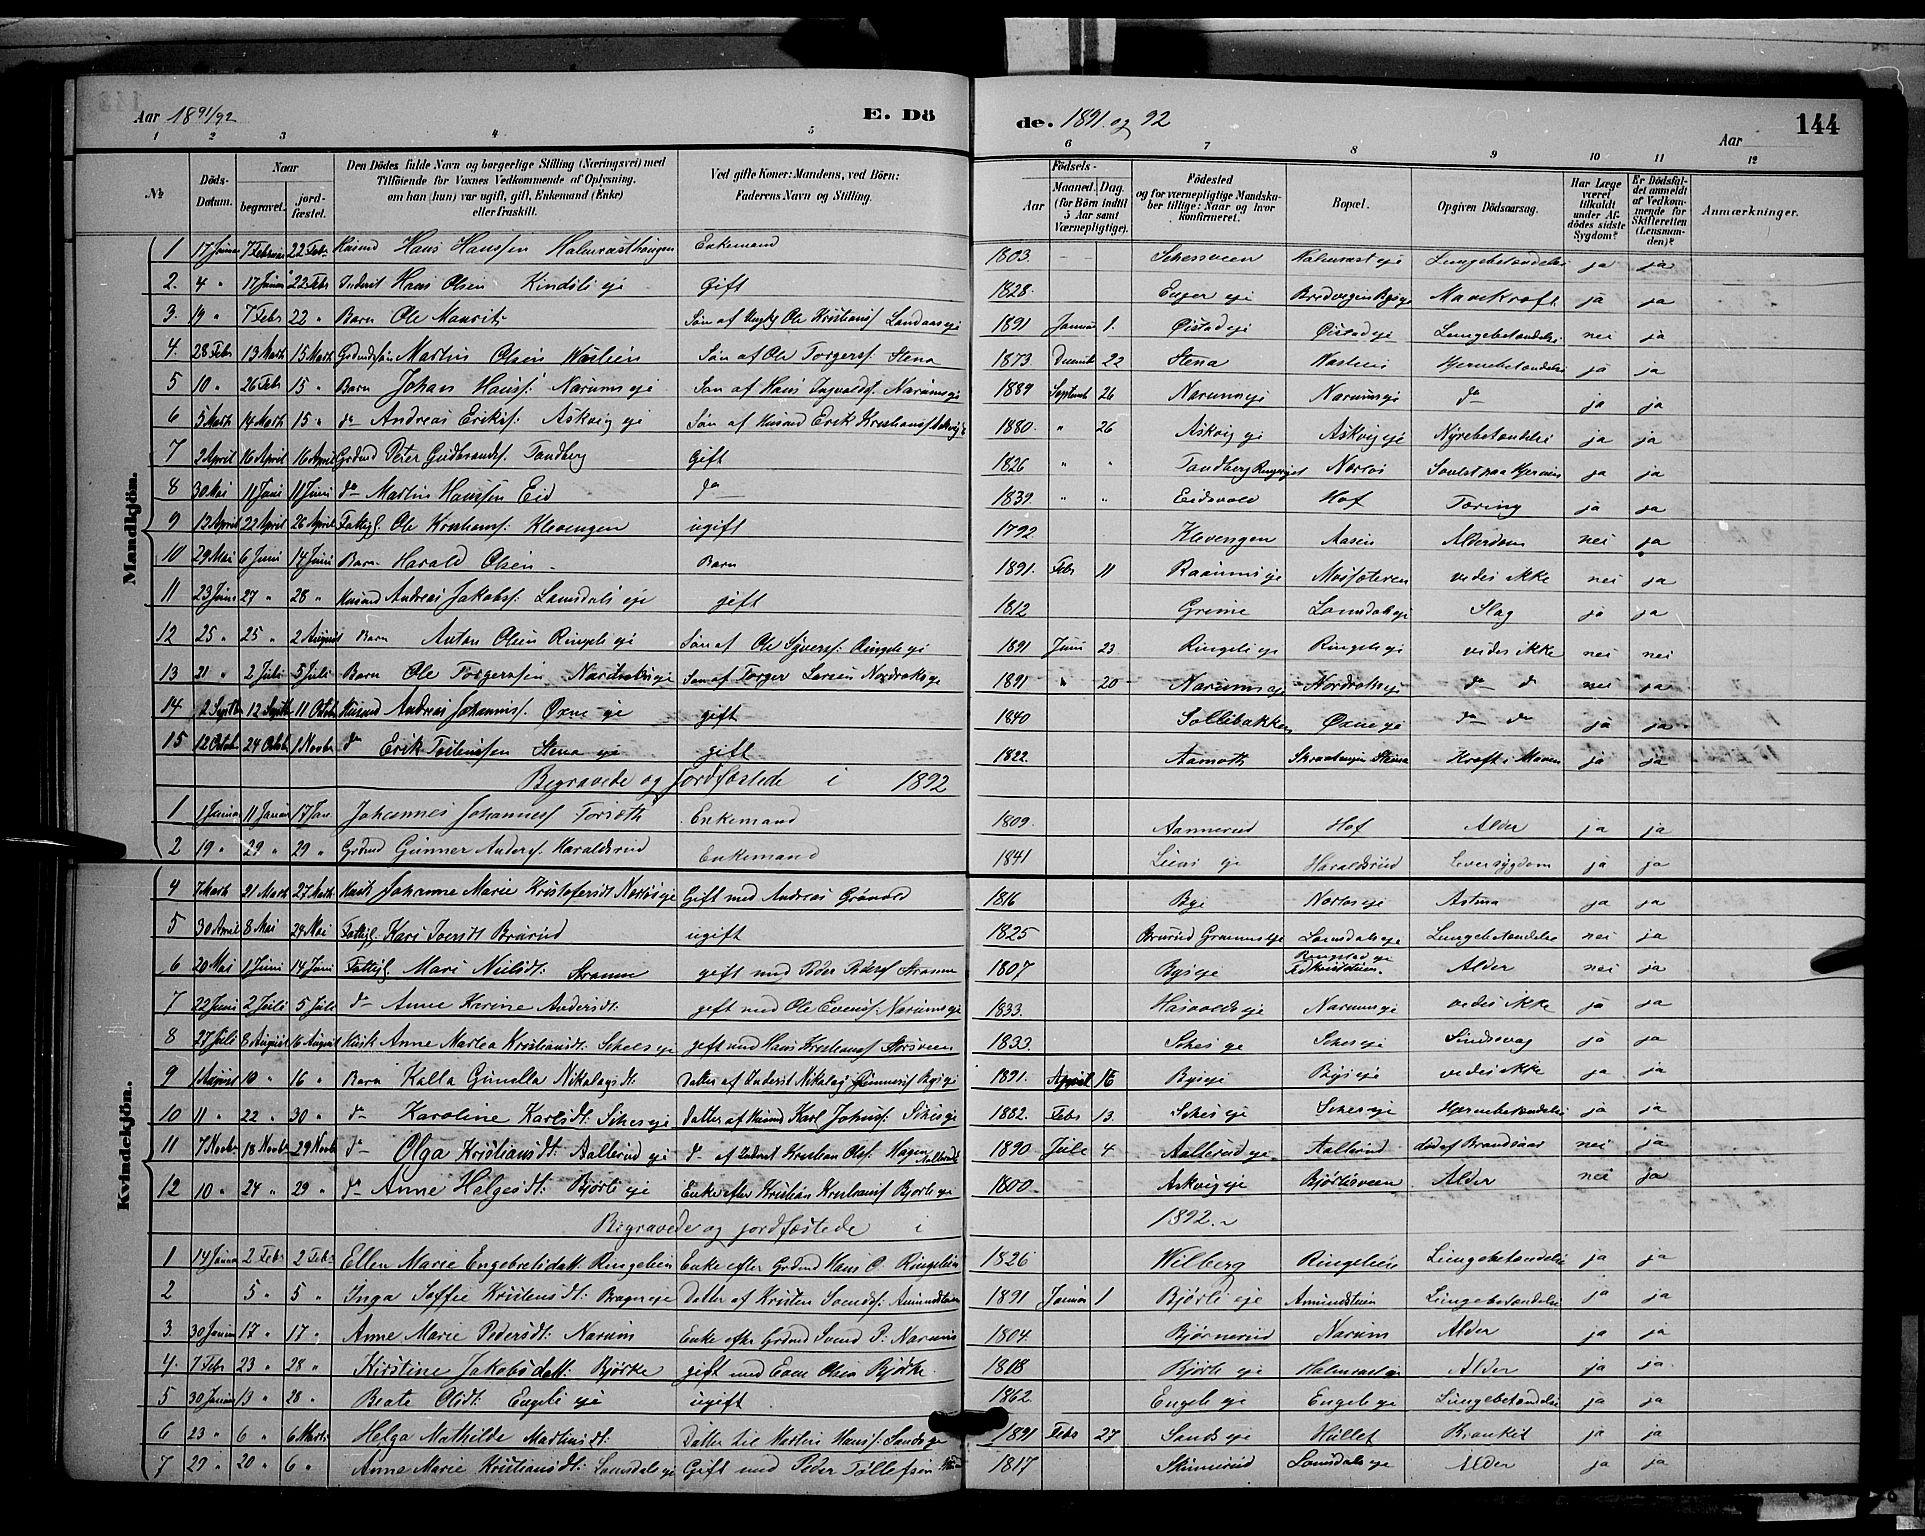 SAH, Søndre Land prestekontor, L/L0002: Klokkerbok nr. 2, 1884-1900, s. 144